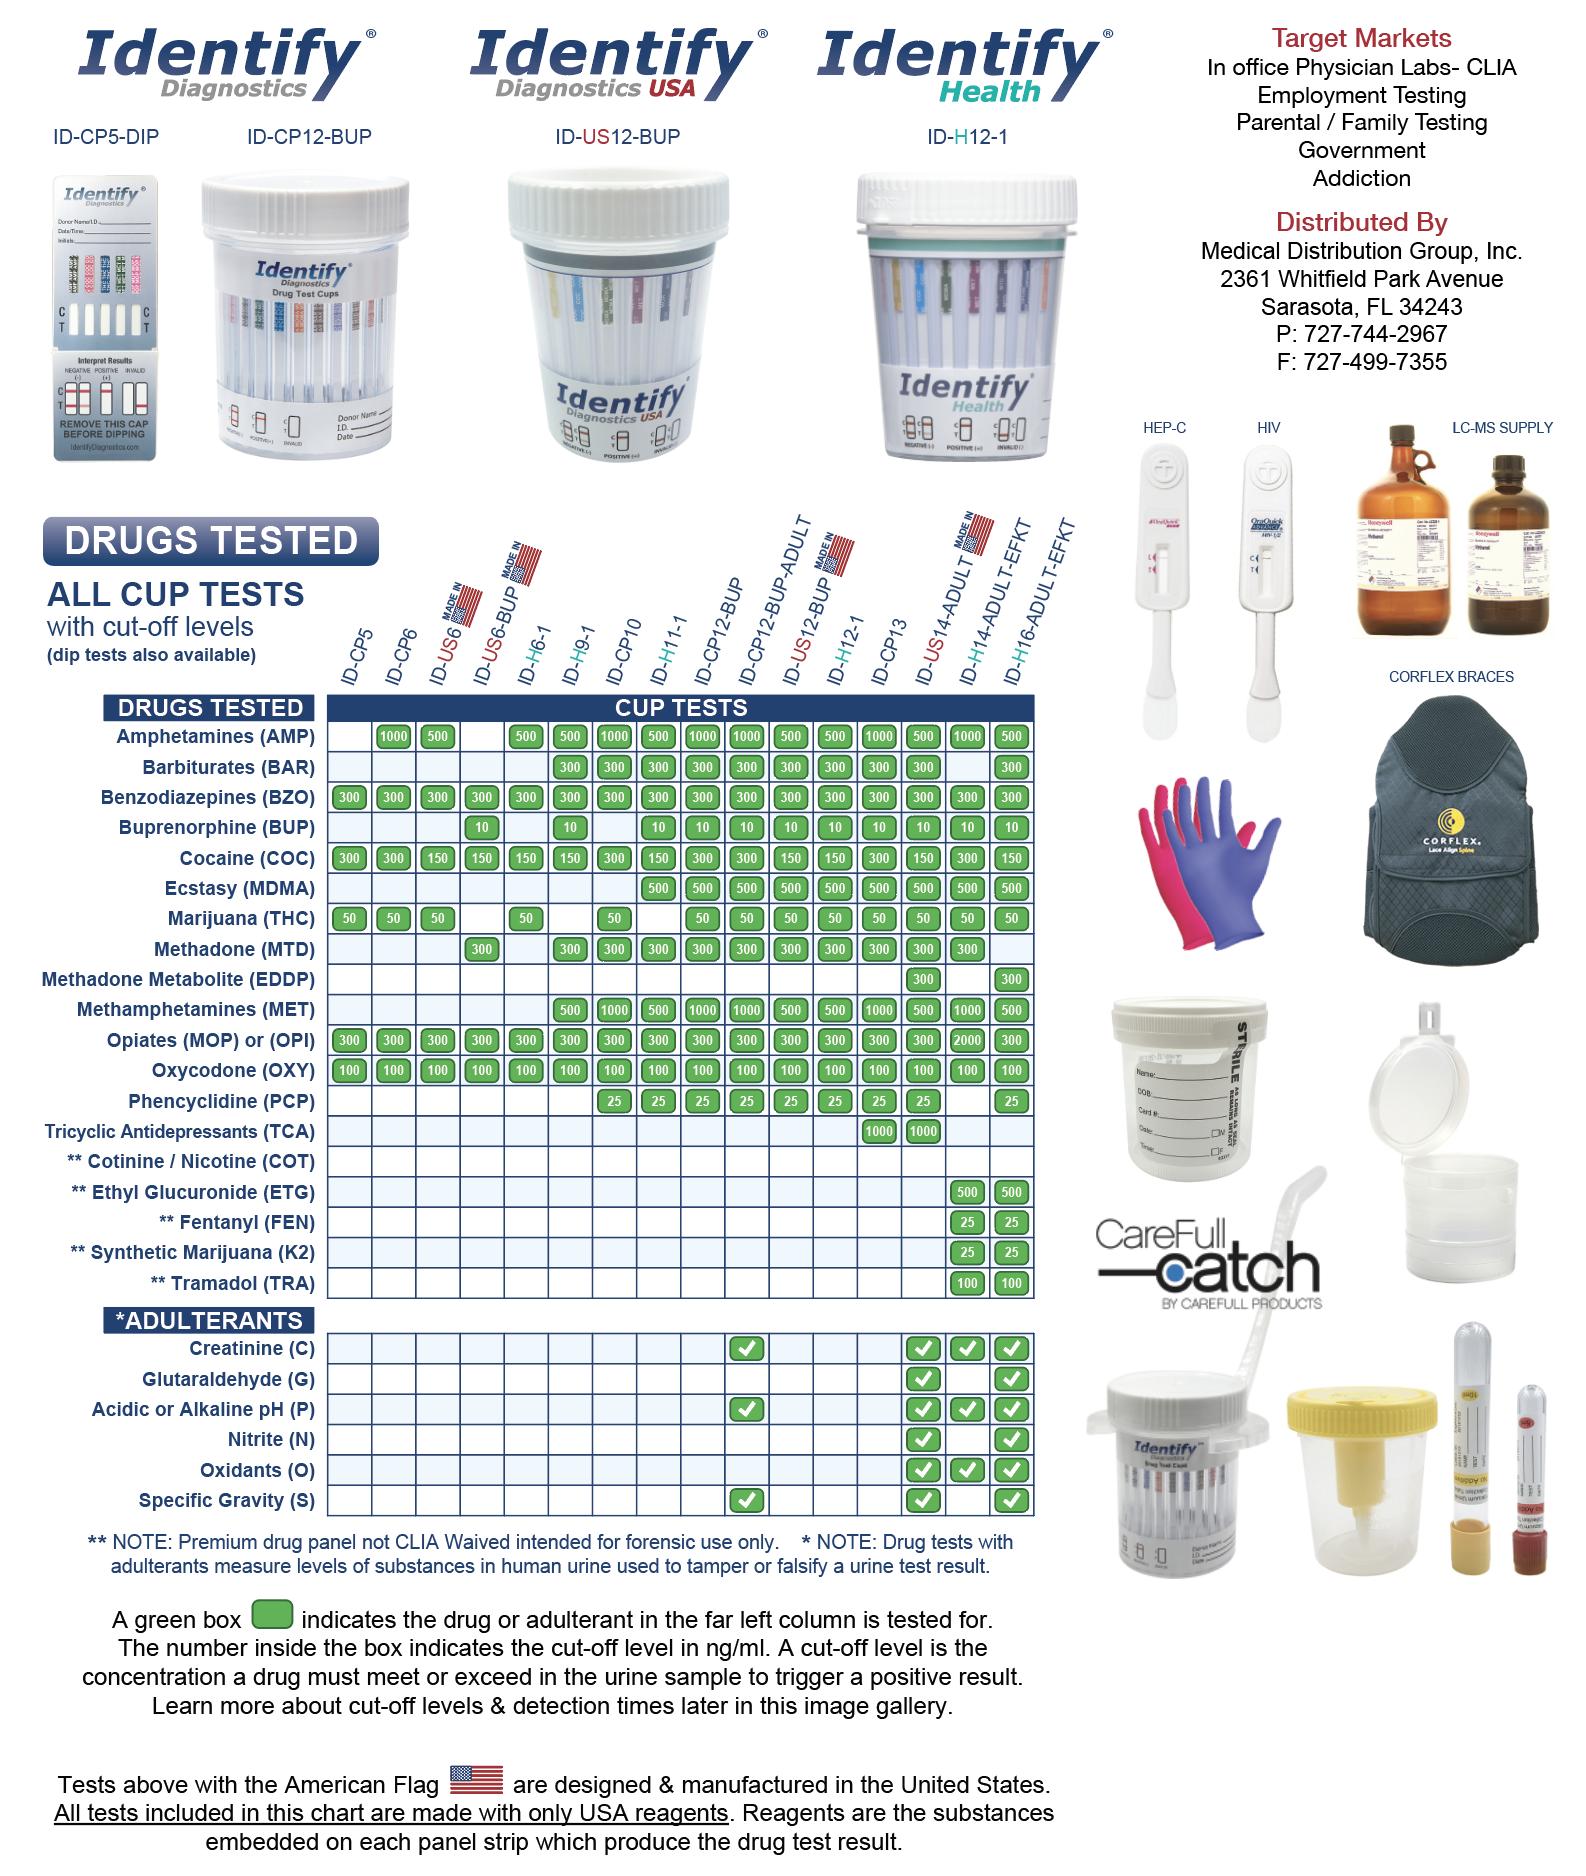 identify-diagnostics-usa-health-drug-test-product-list-may-2019.jpg